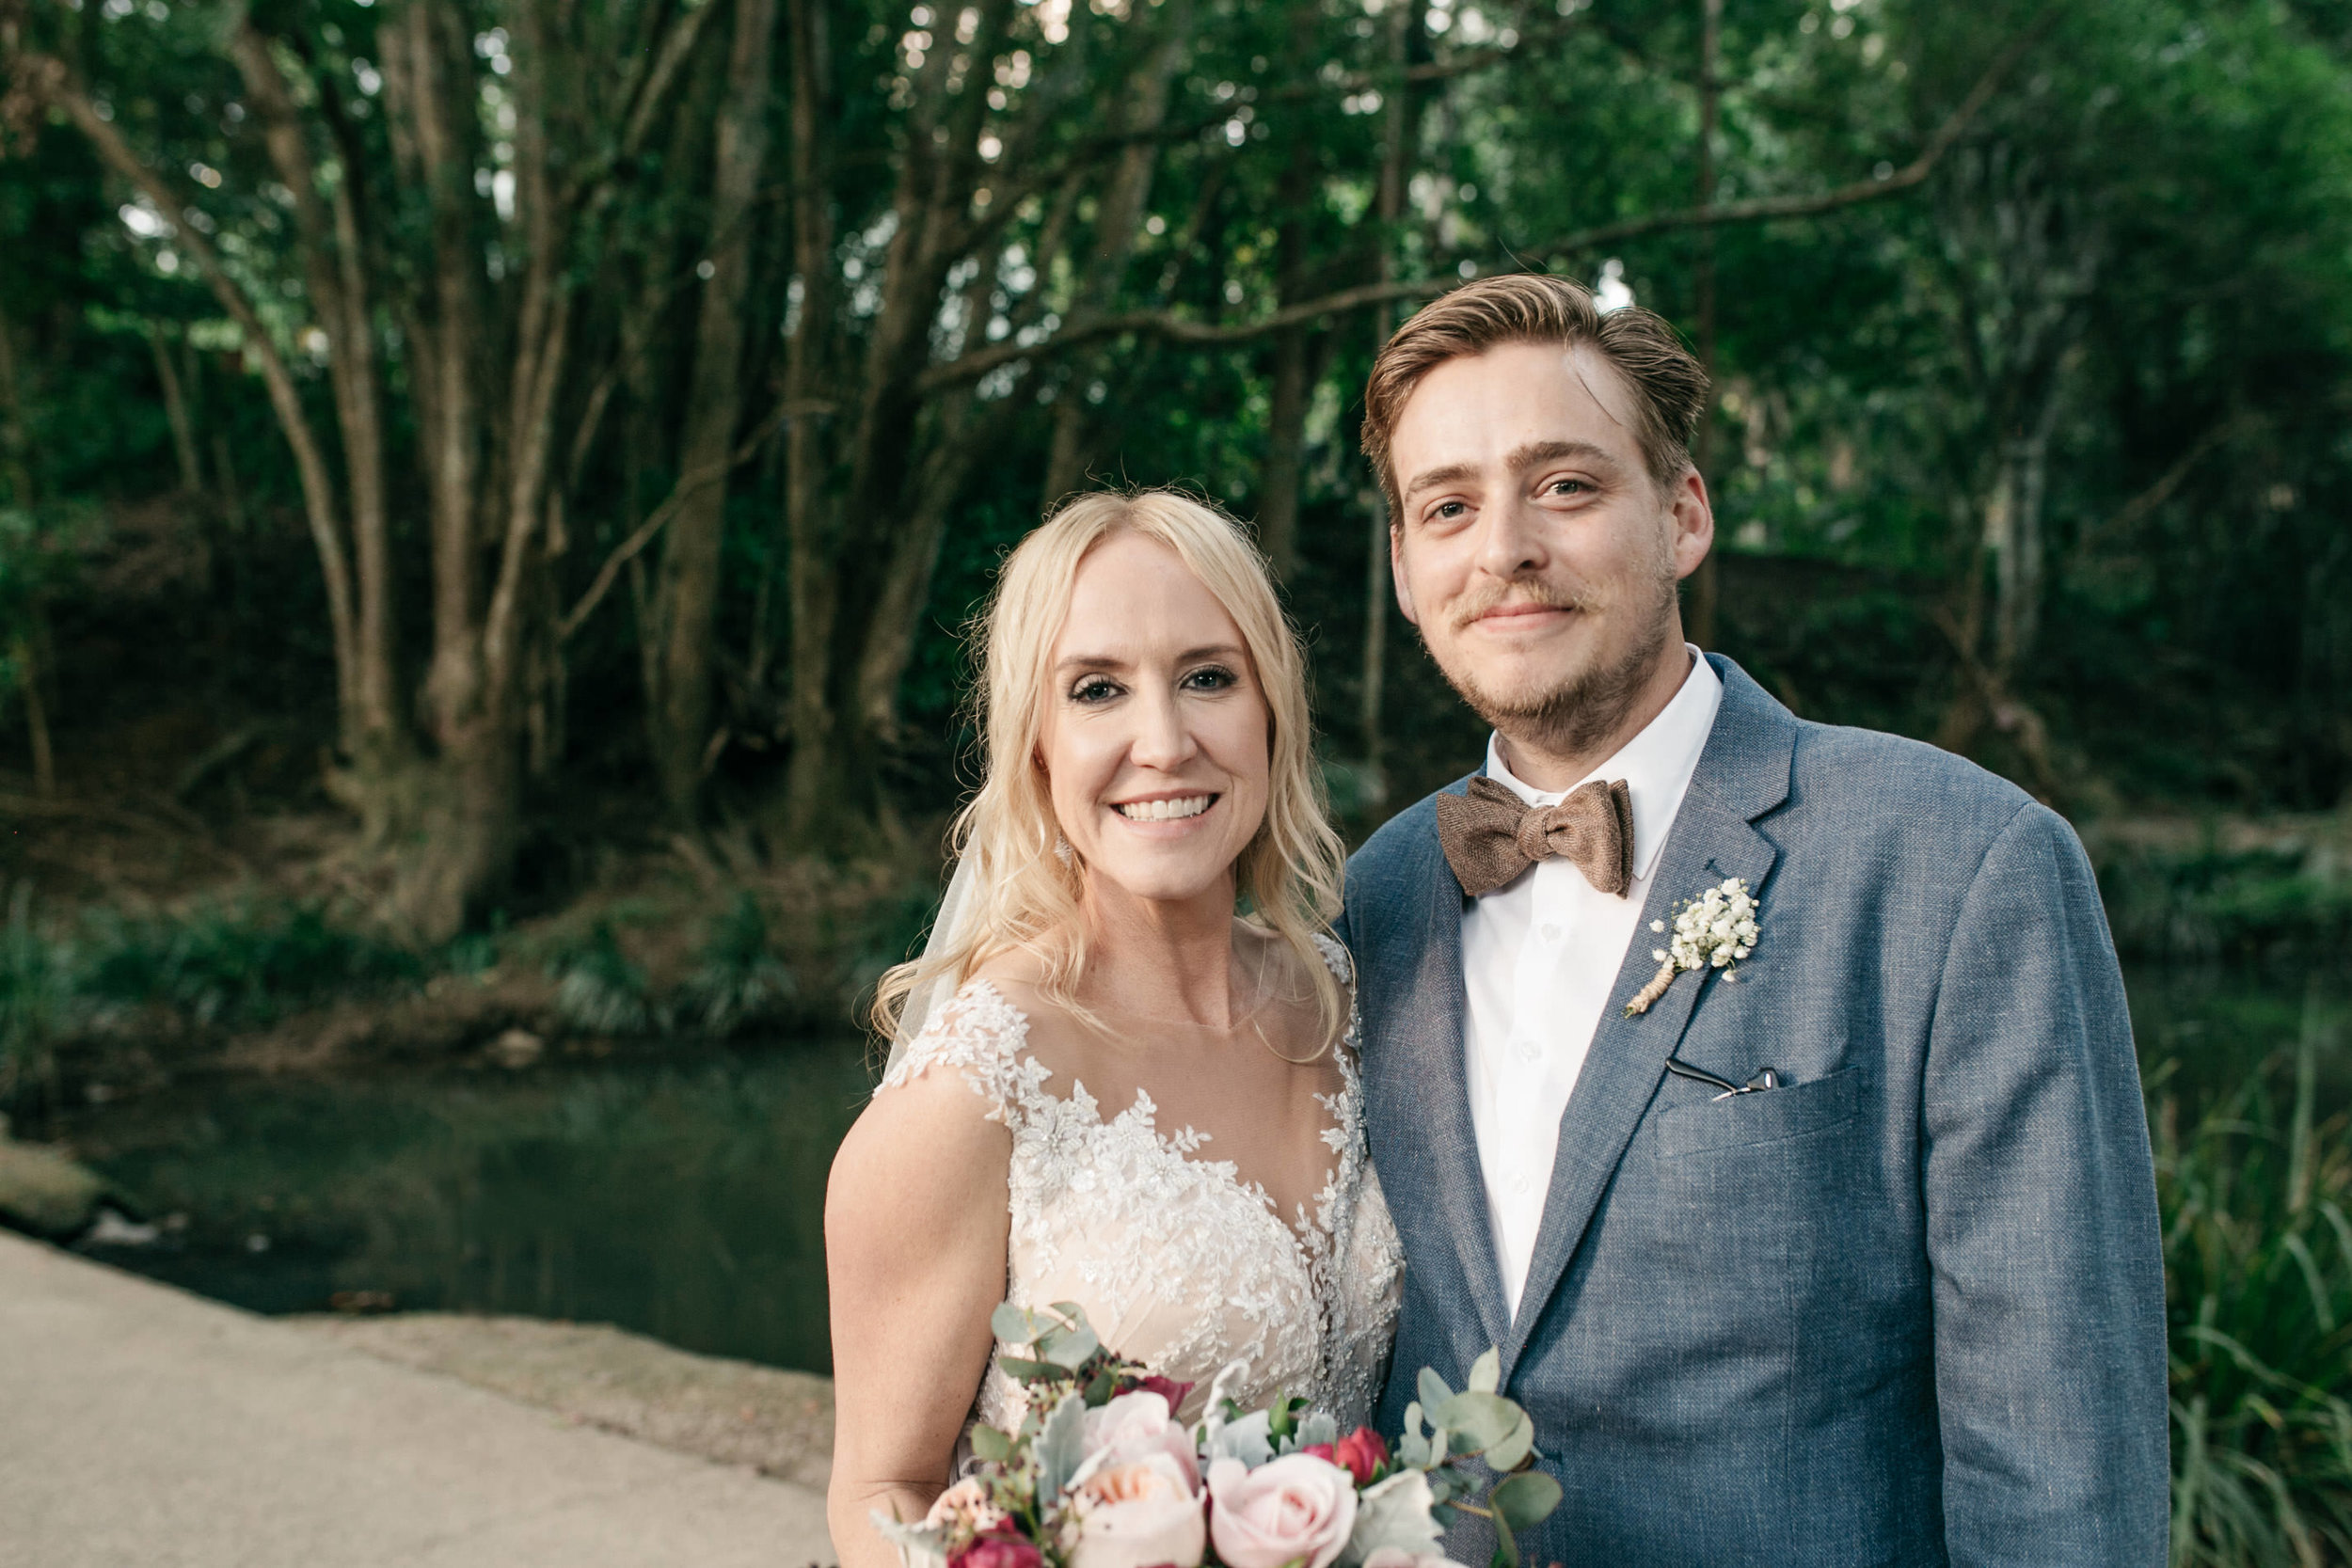 True North Photography_Boomerang Farm_Stacey and Isaac_Gold Coast Wedding_Barm Wedding_Hinterland Wedding-159.jpg